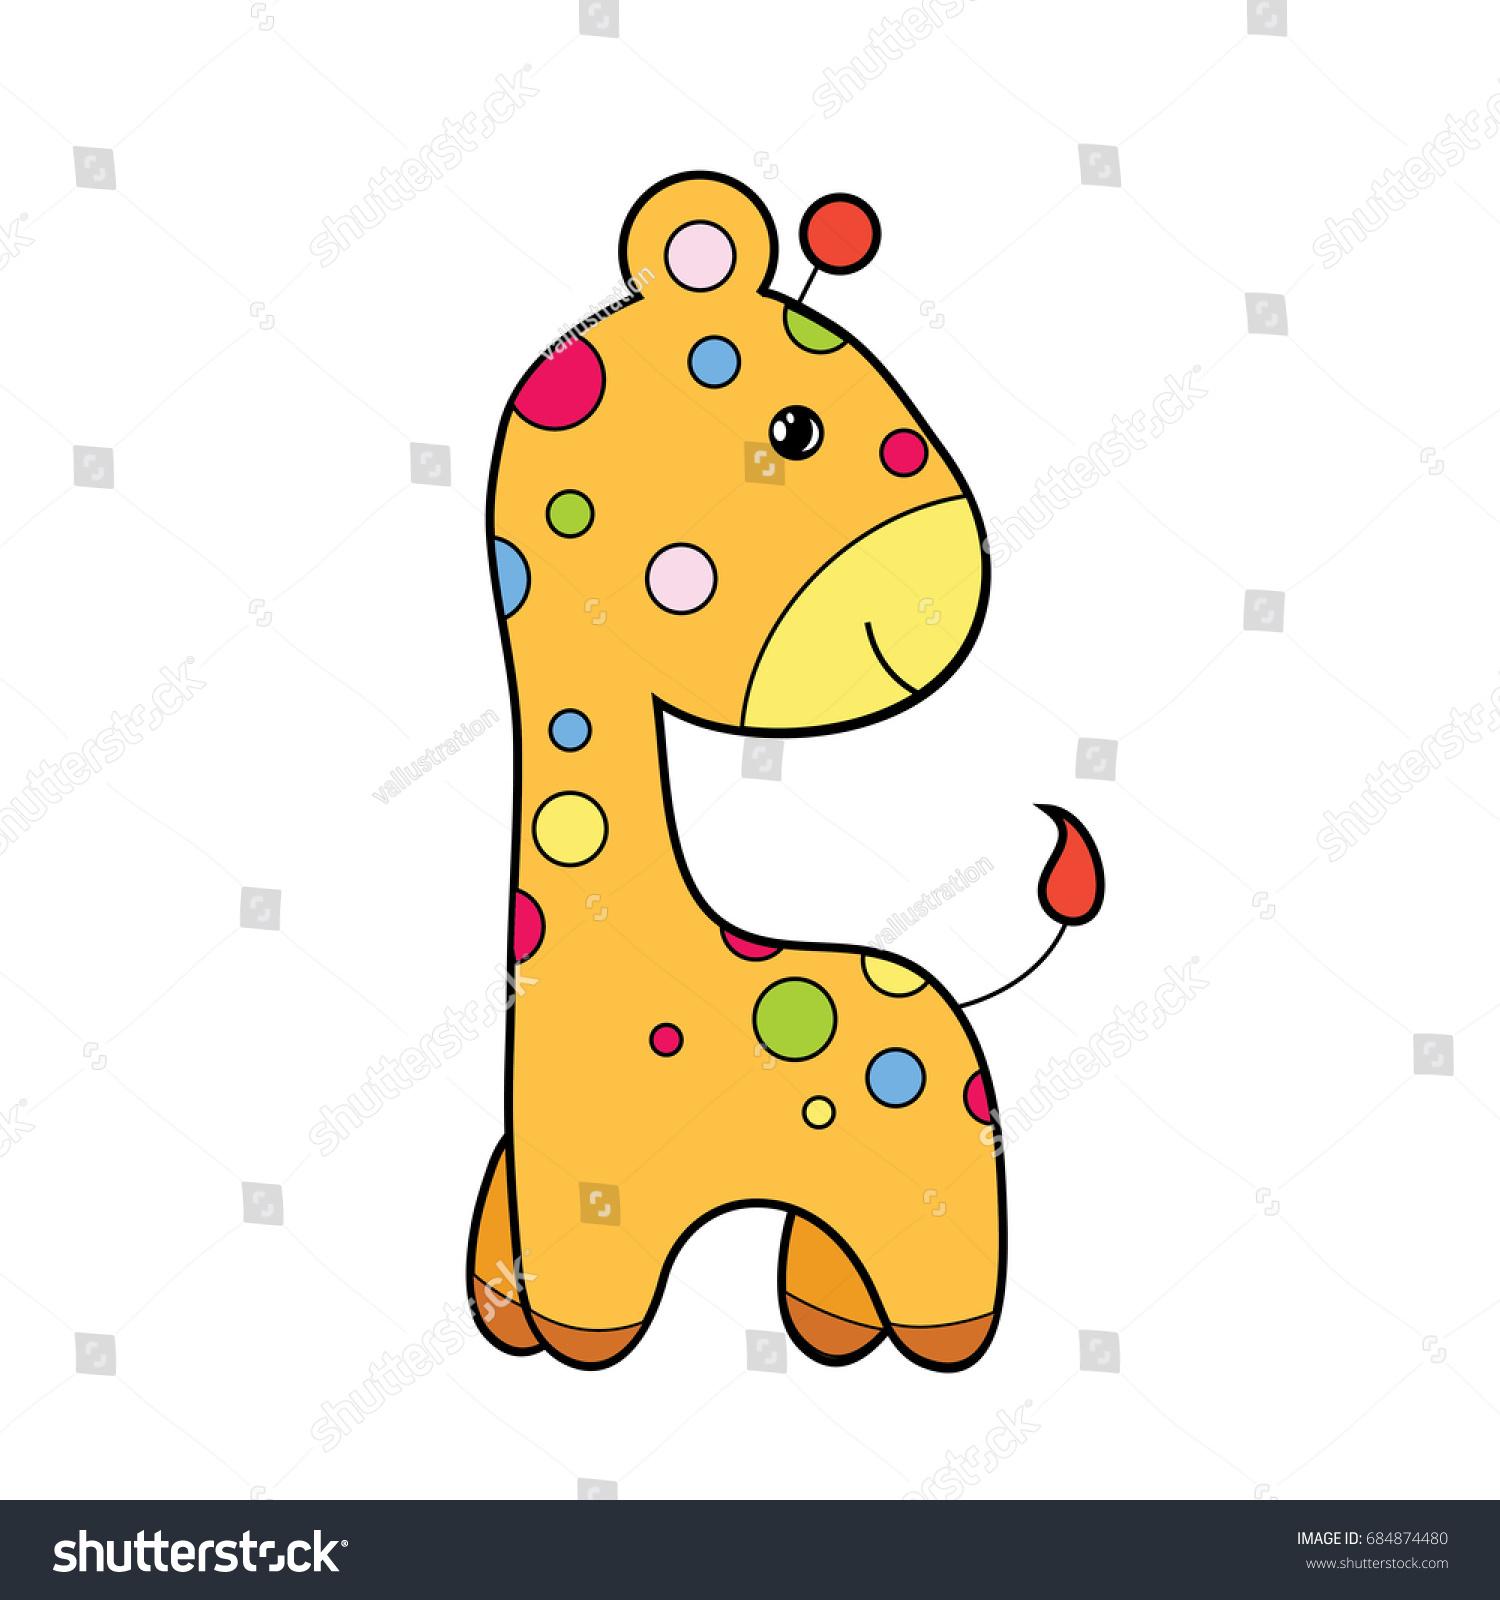 hight resolution of cute giraffe clipart coloring activity vector illustration